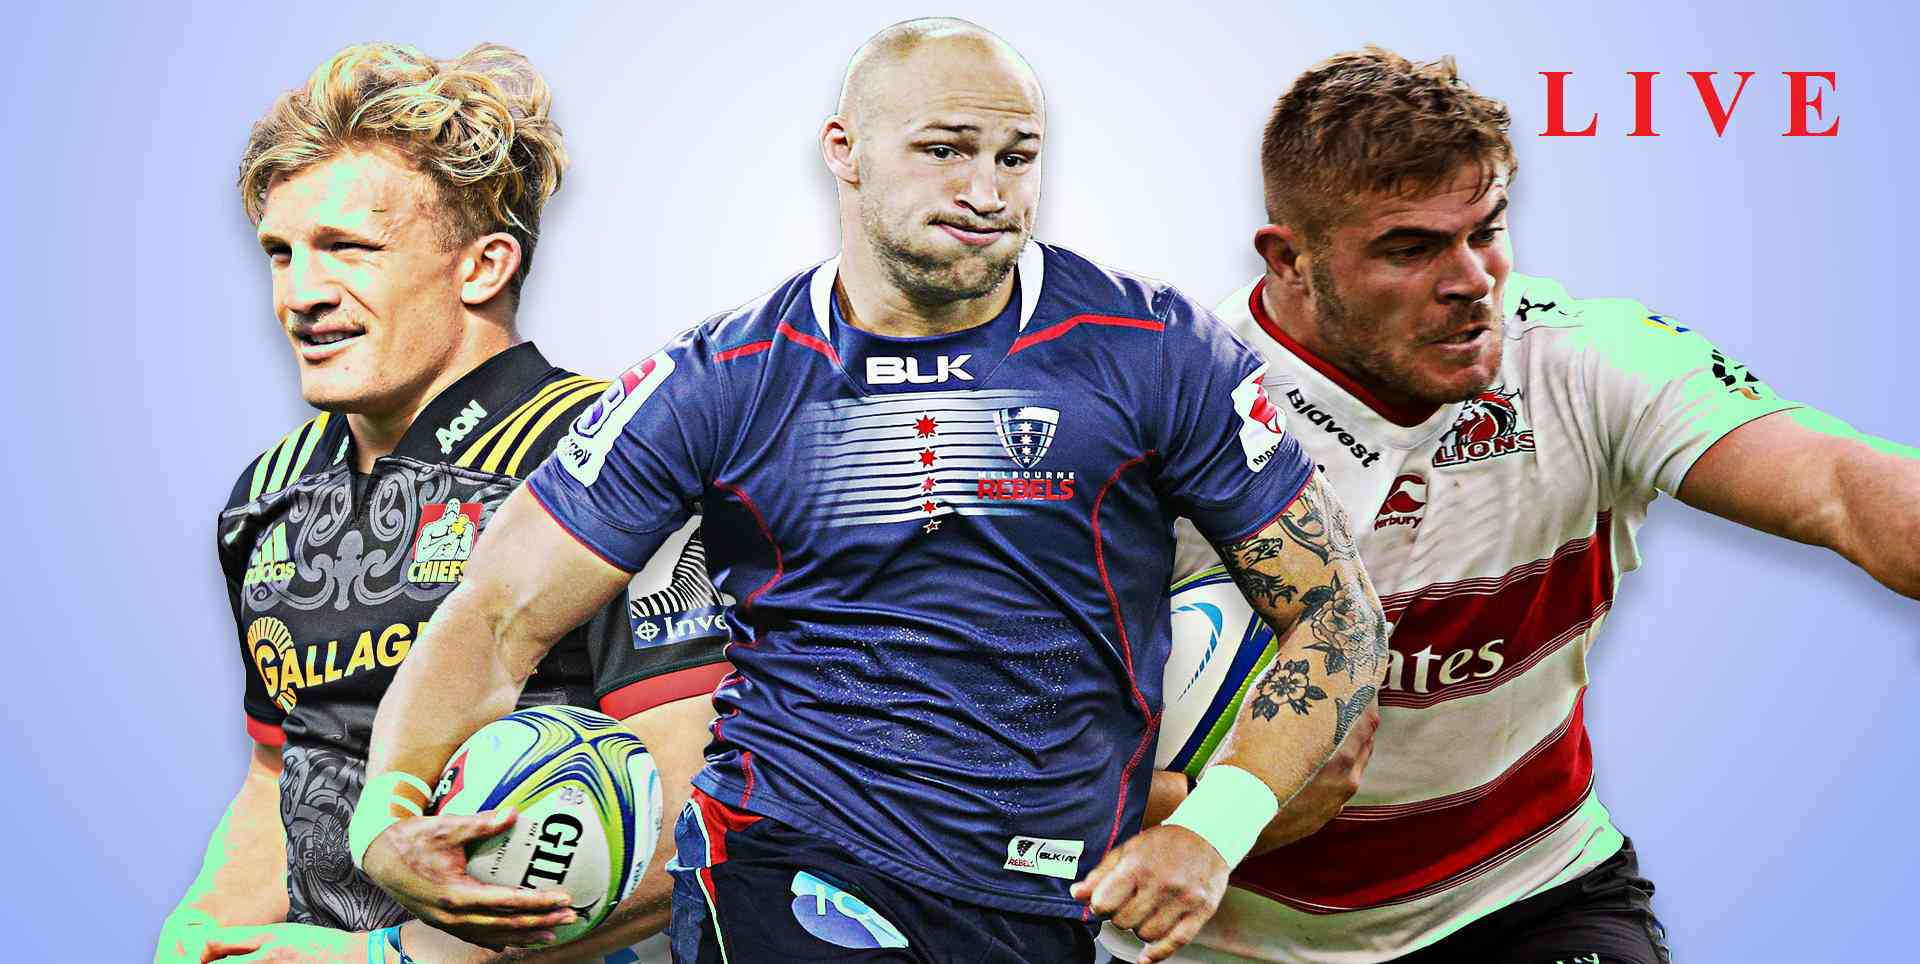 Waikato vs Hawkes Bay 2016 Rugby Live